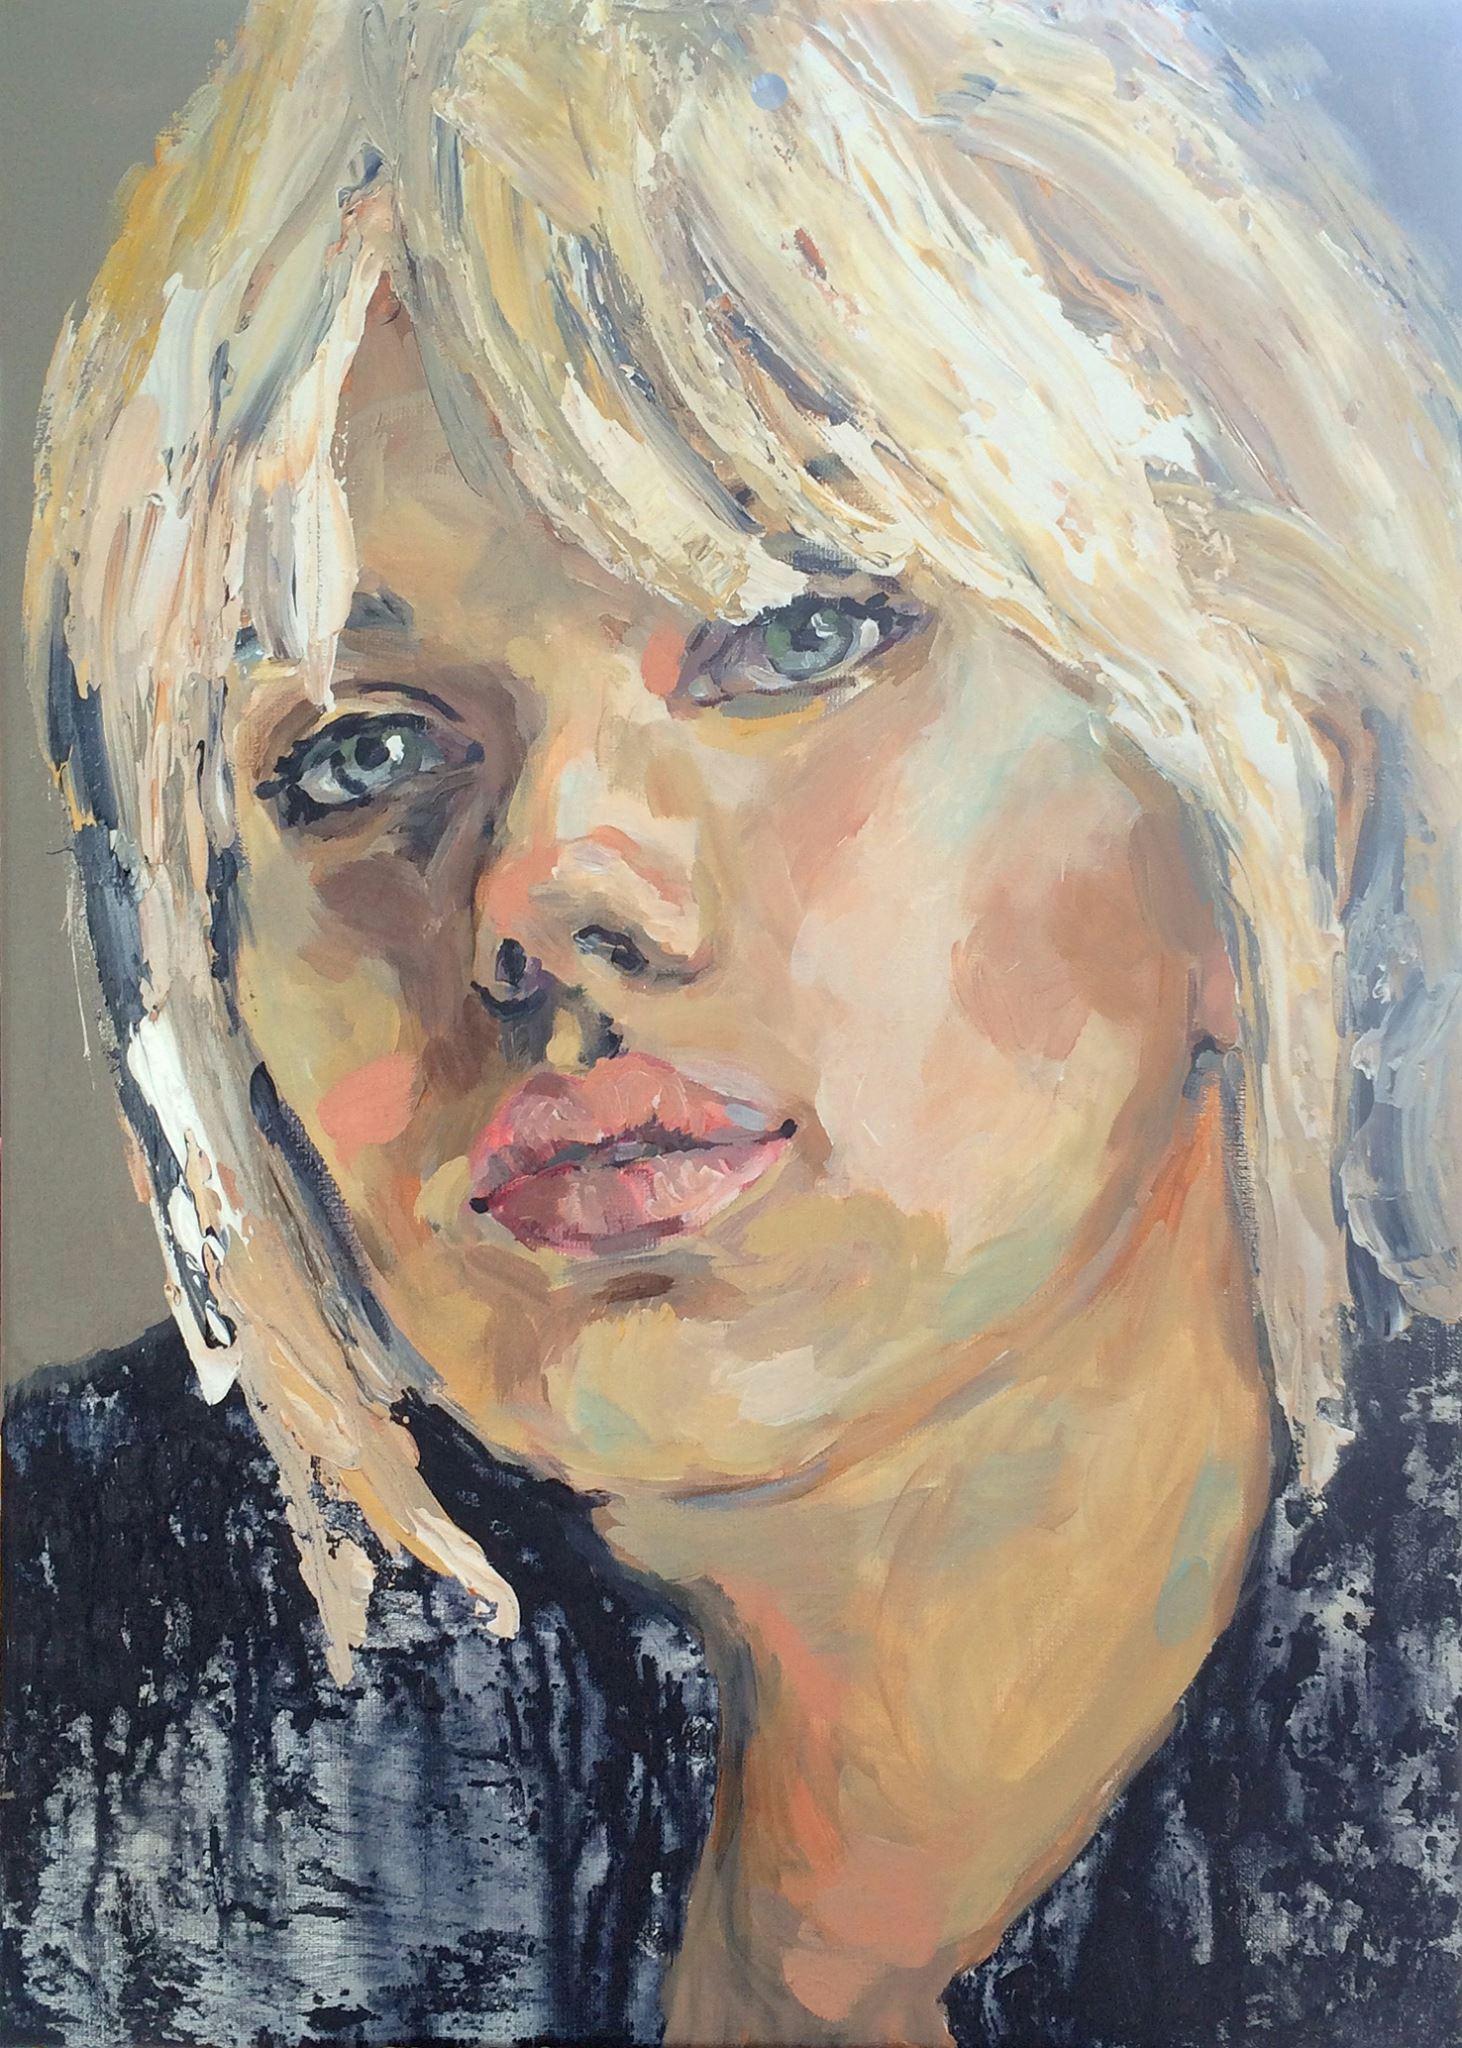 Portretschilderij Scarlett Johansson